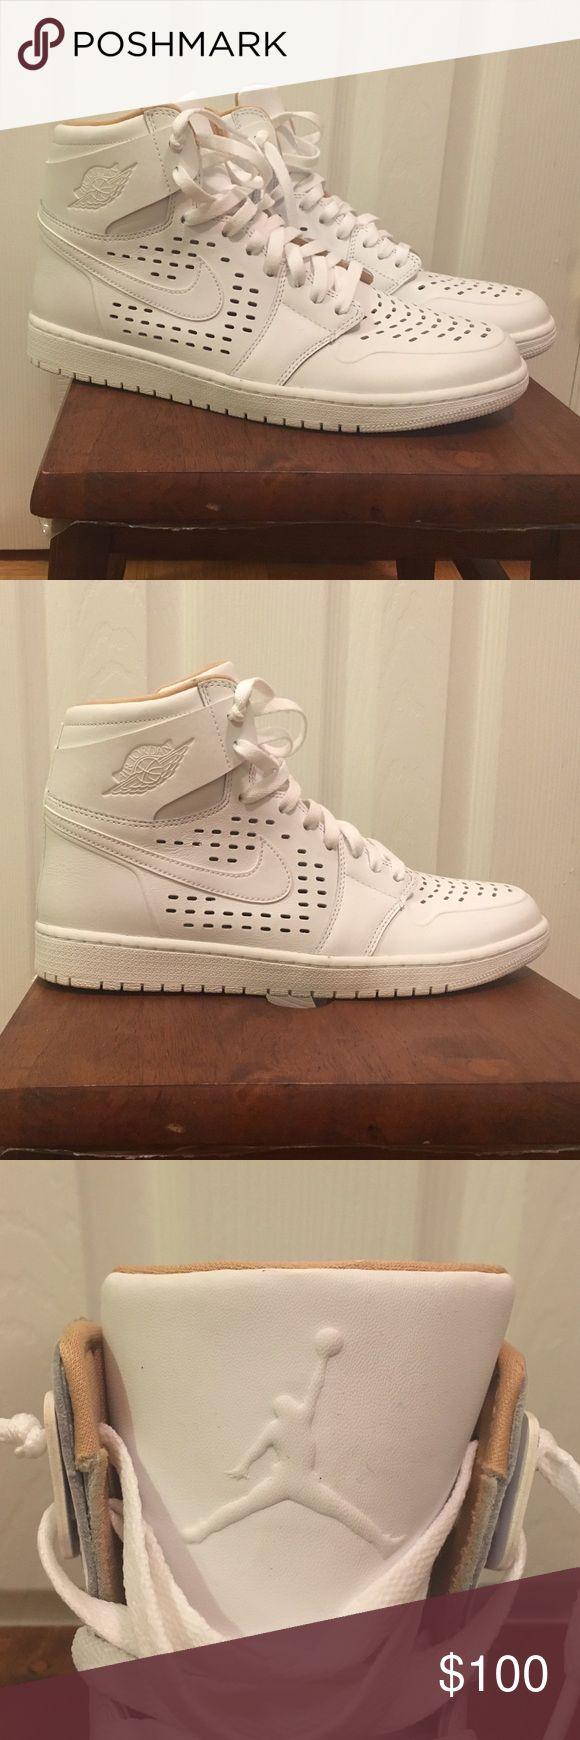 NWOB Nike Air Jordan One Engineered Perf sneakers The ultimate in cool kicks. Brand new (NWOB) Men's Nike Air Jordan One Engineered Perf sneakers. Never worn! True to size. Purchased on original release date. Nike Shoes Sneakers